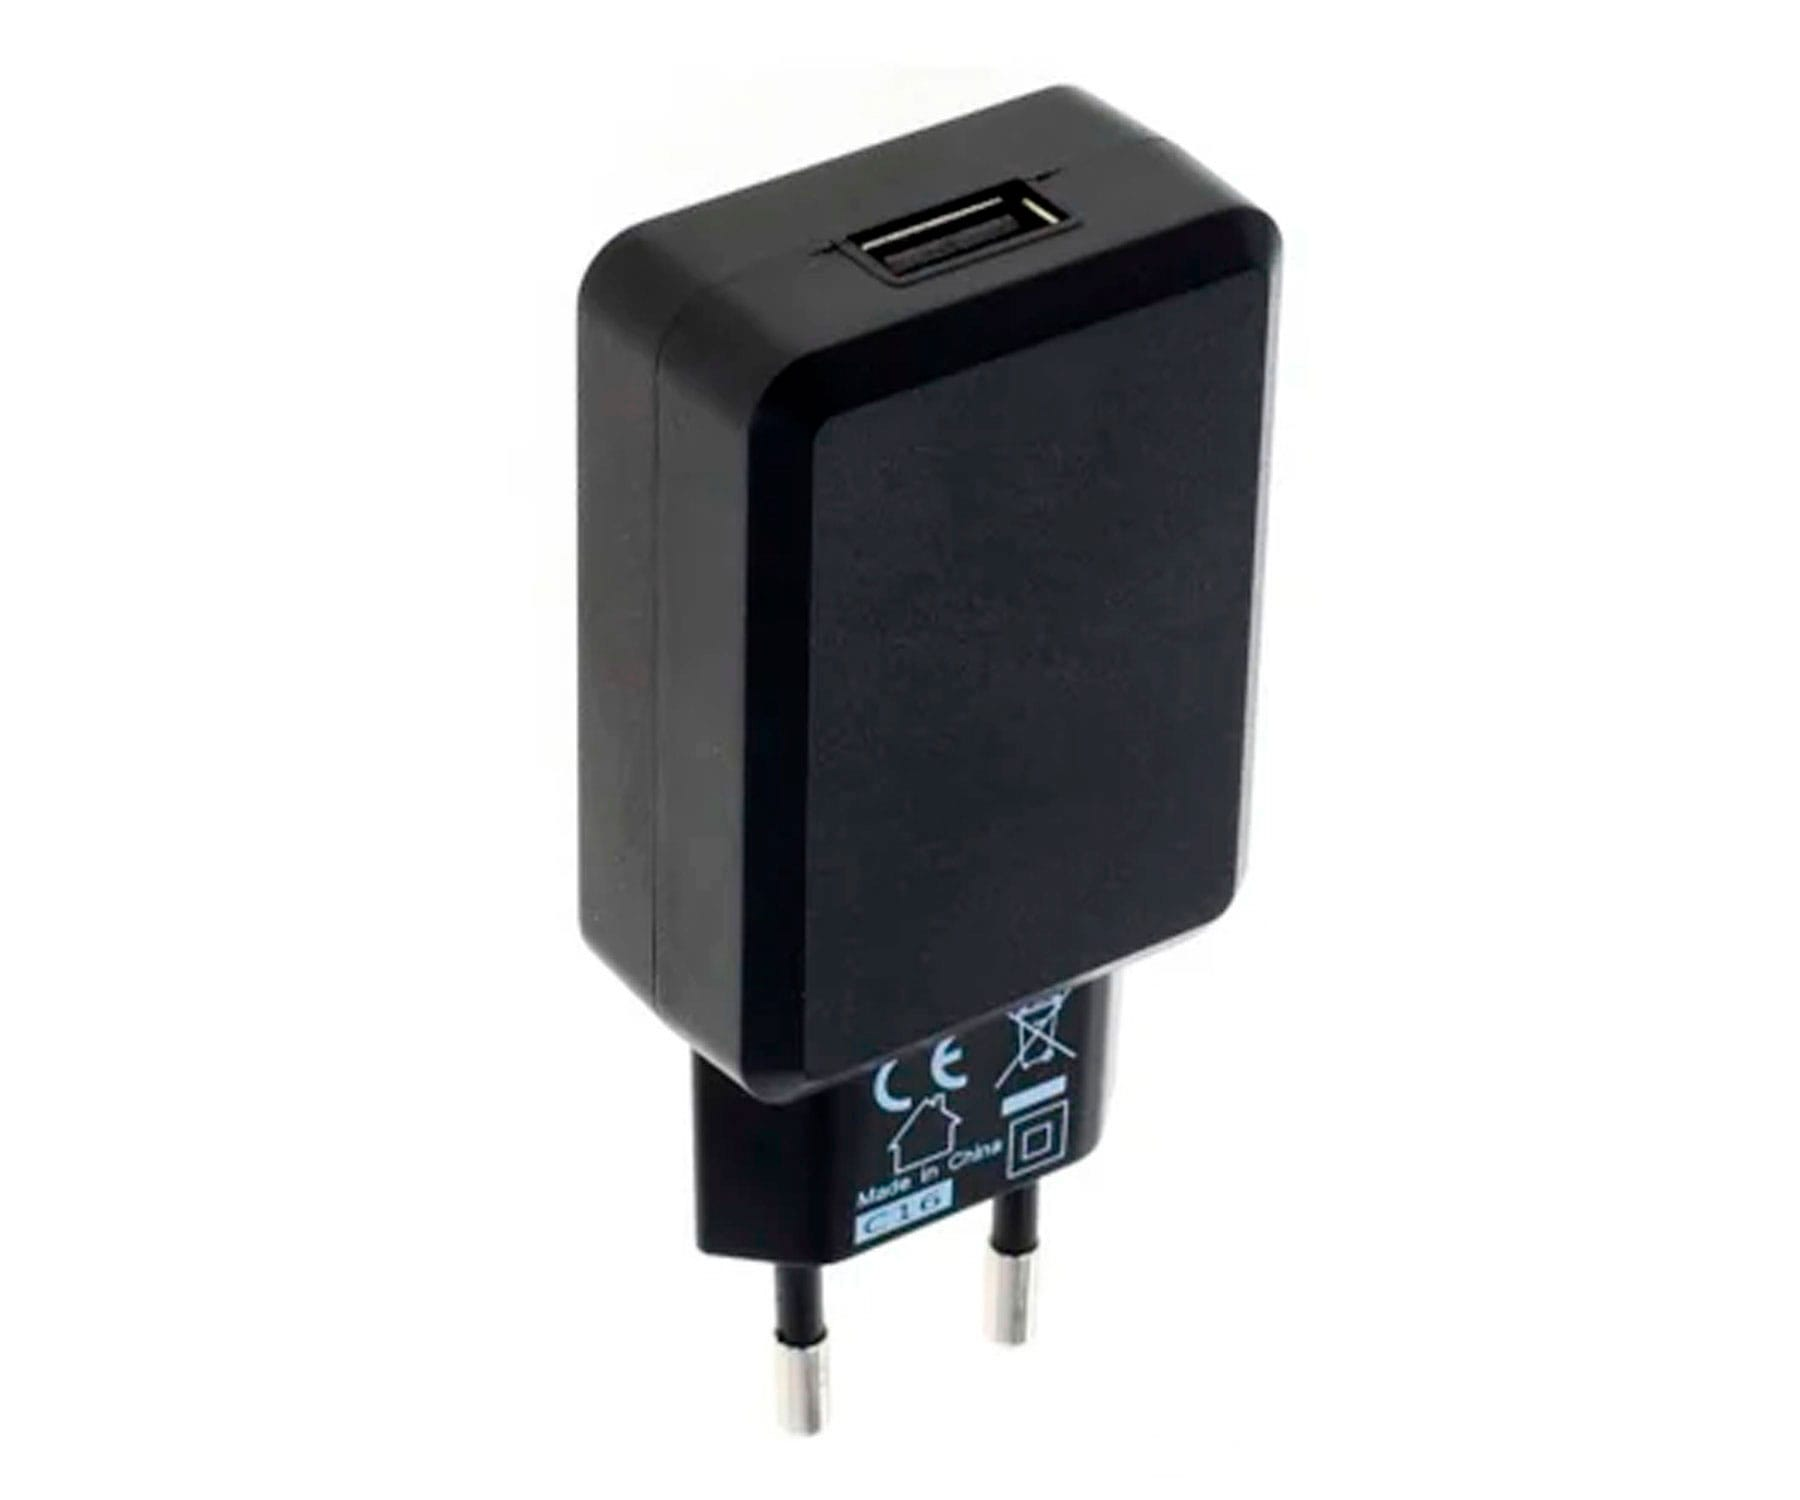 VSMART G010213 NEGRO QUICK CHARGE 3.0 USB R1/L1